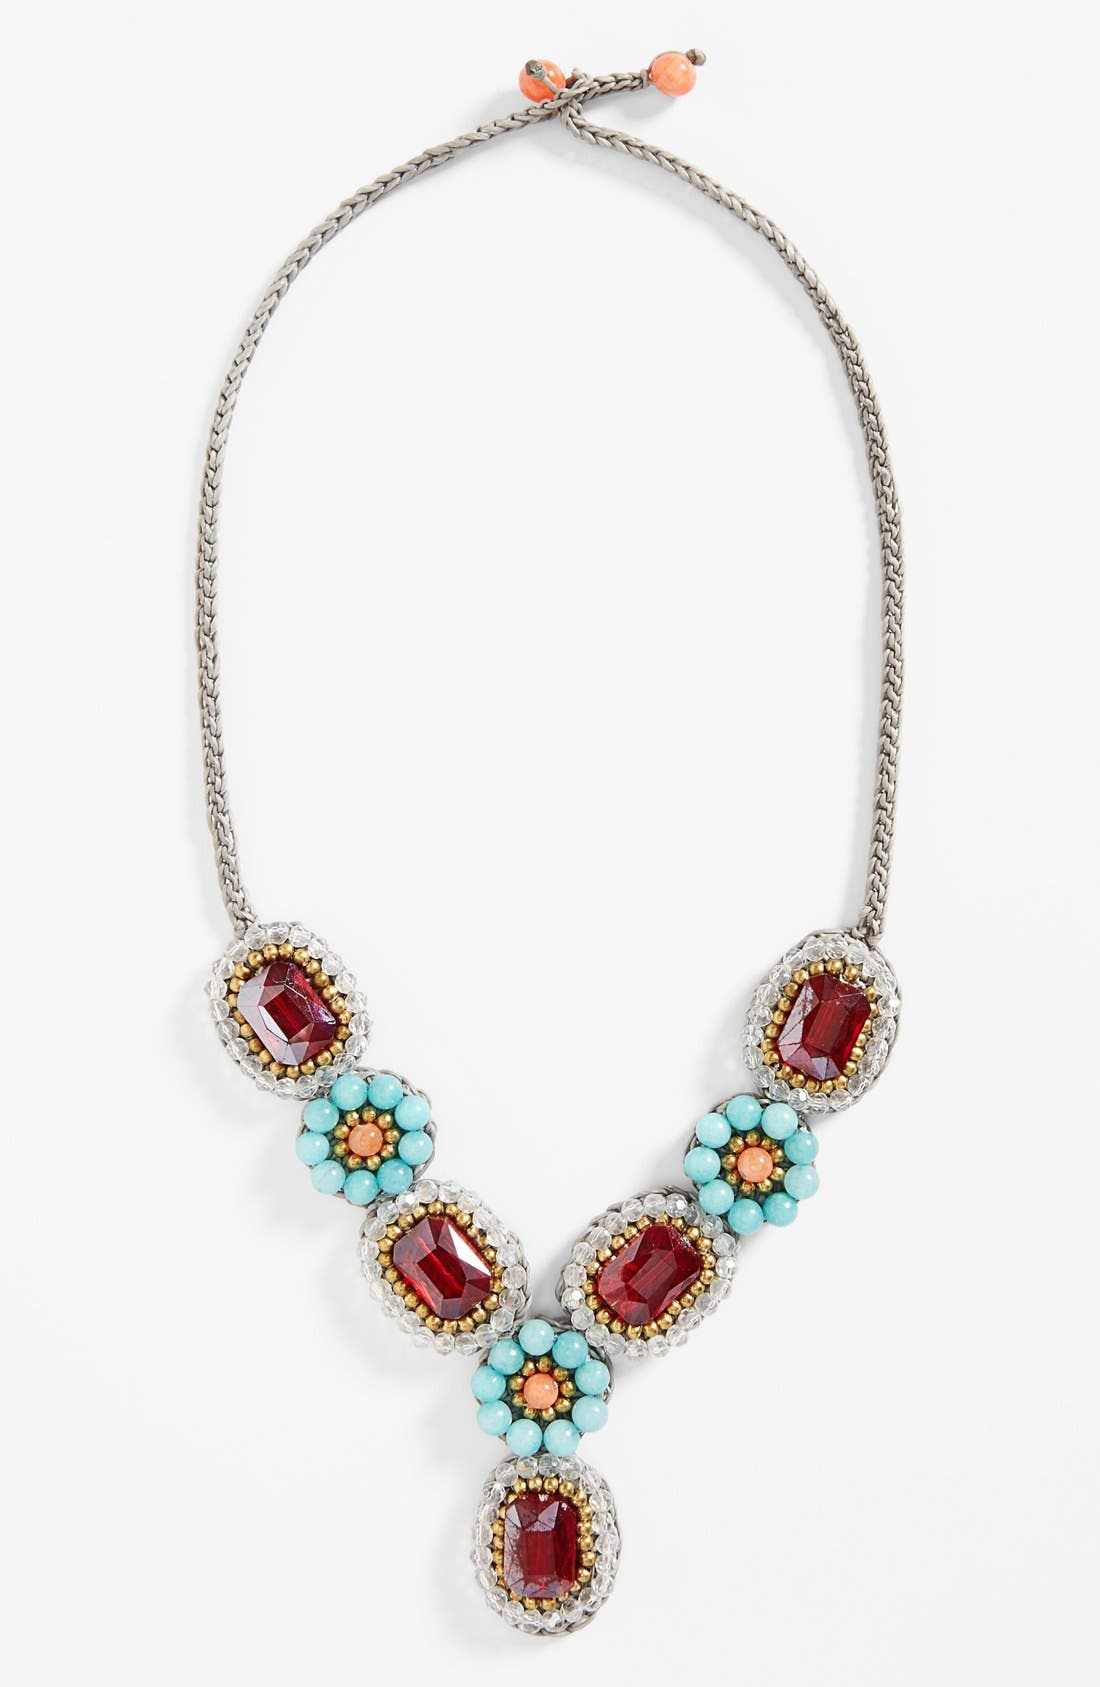 Alternate Image 1 Selected - Panacea Crystal Quartz Statement Necklace